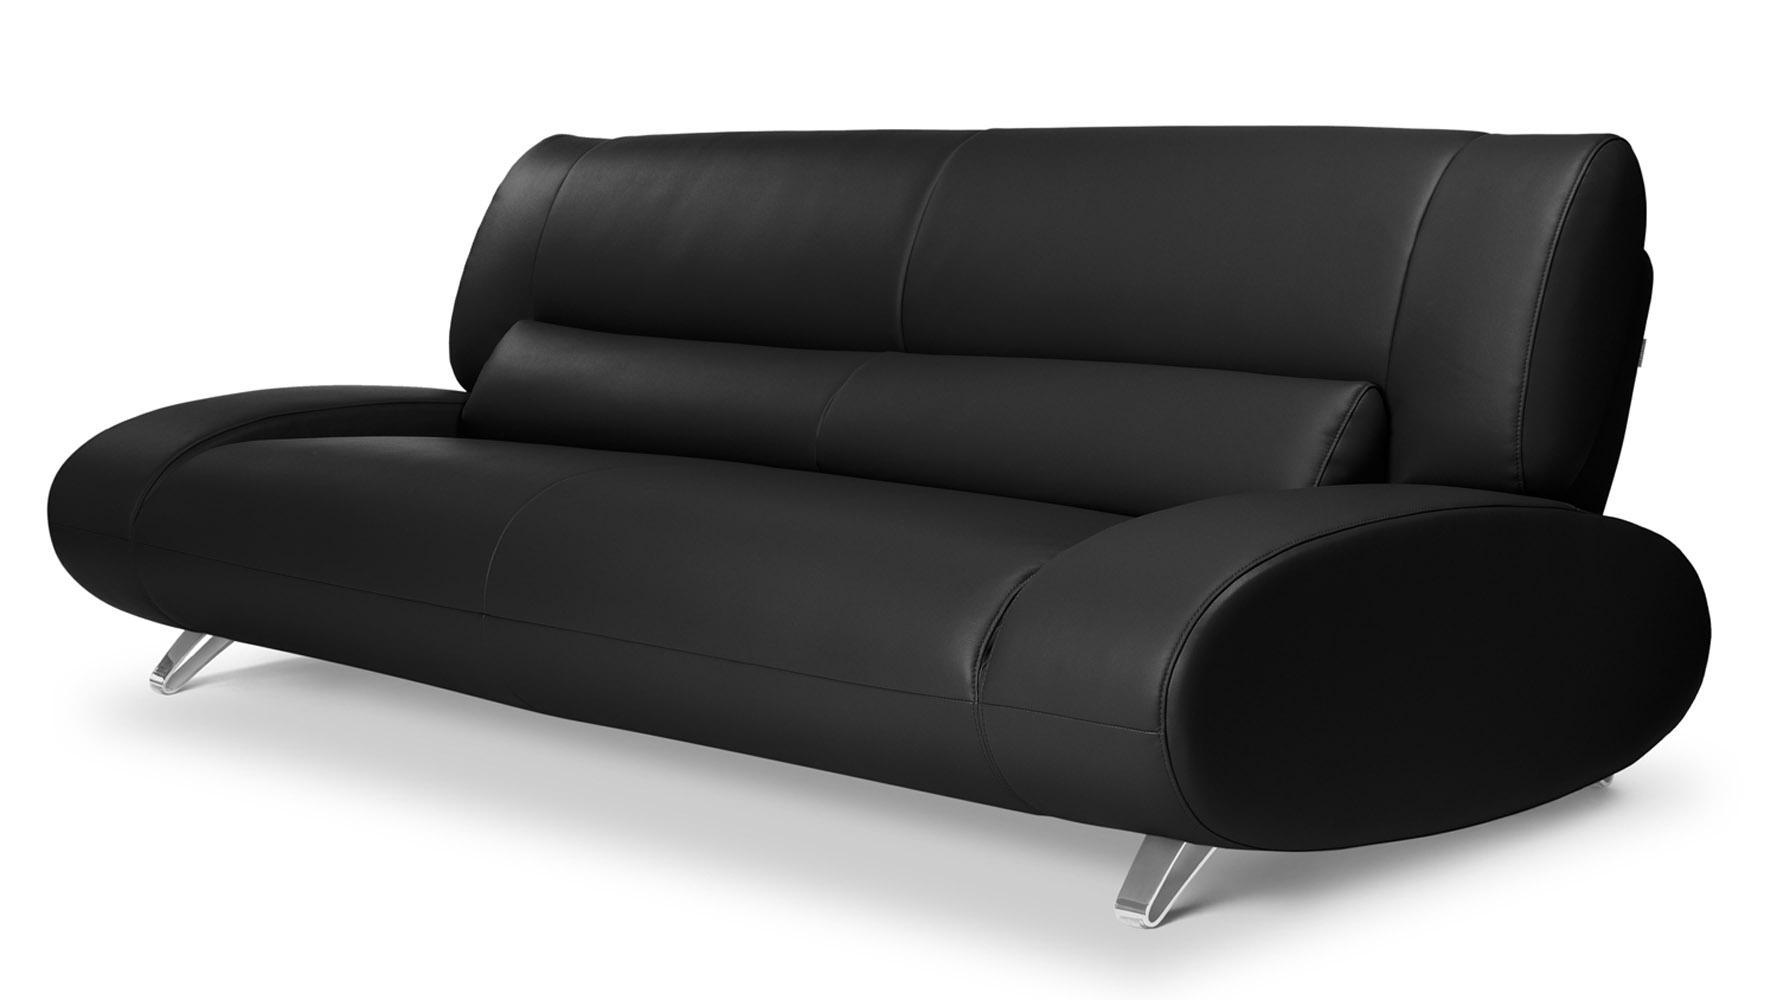 Aspen Group | Zuri Furniture Within Aspen Leather Sofas (Image 4 of 20)